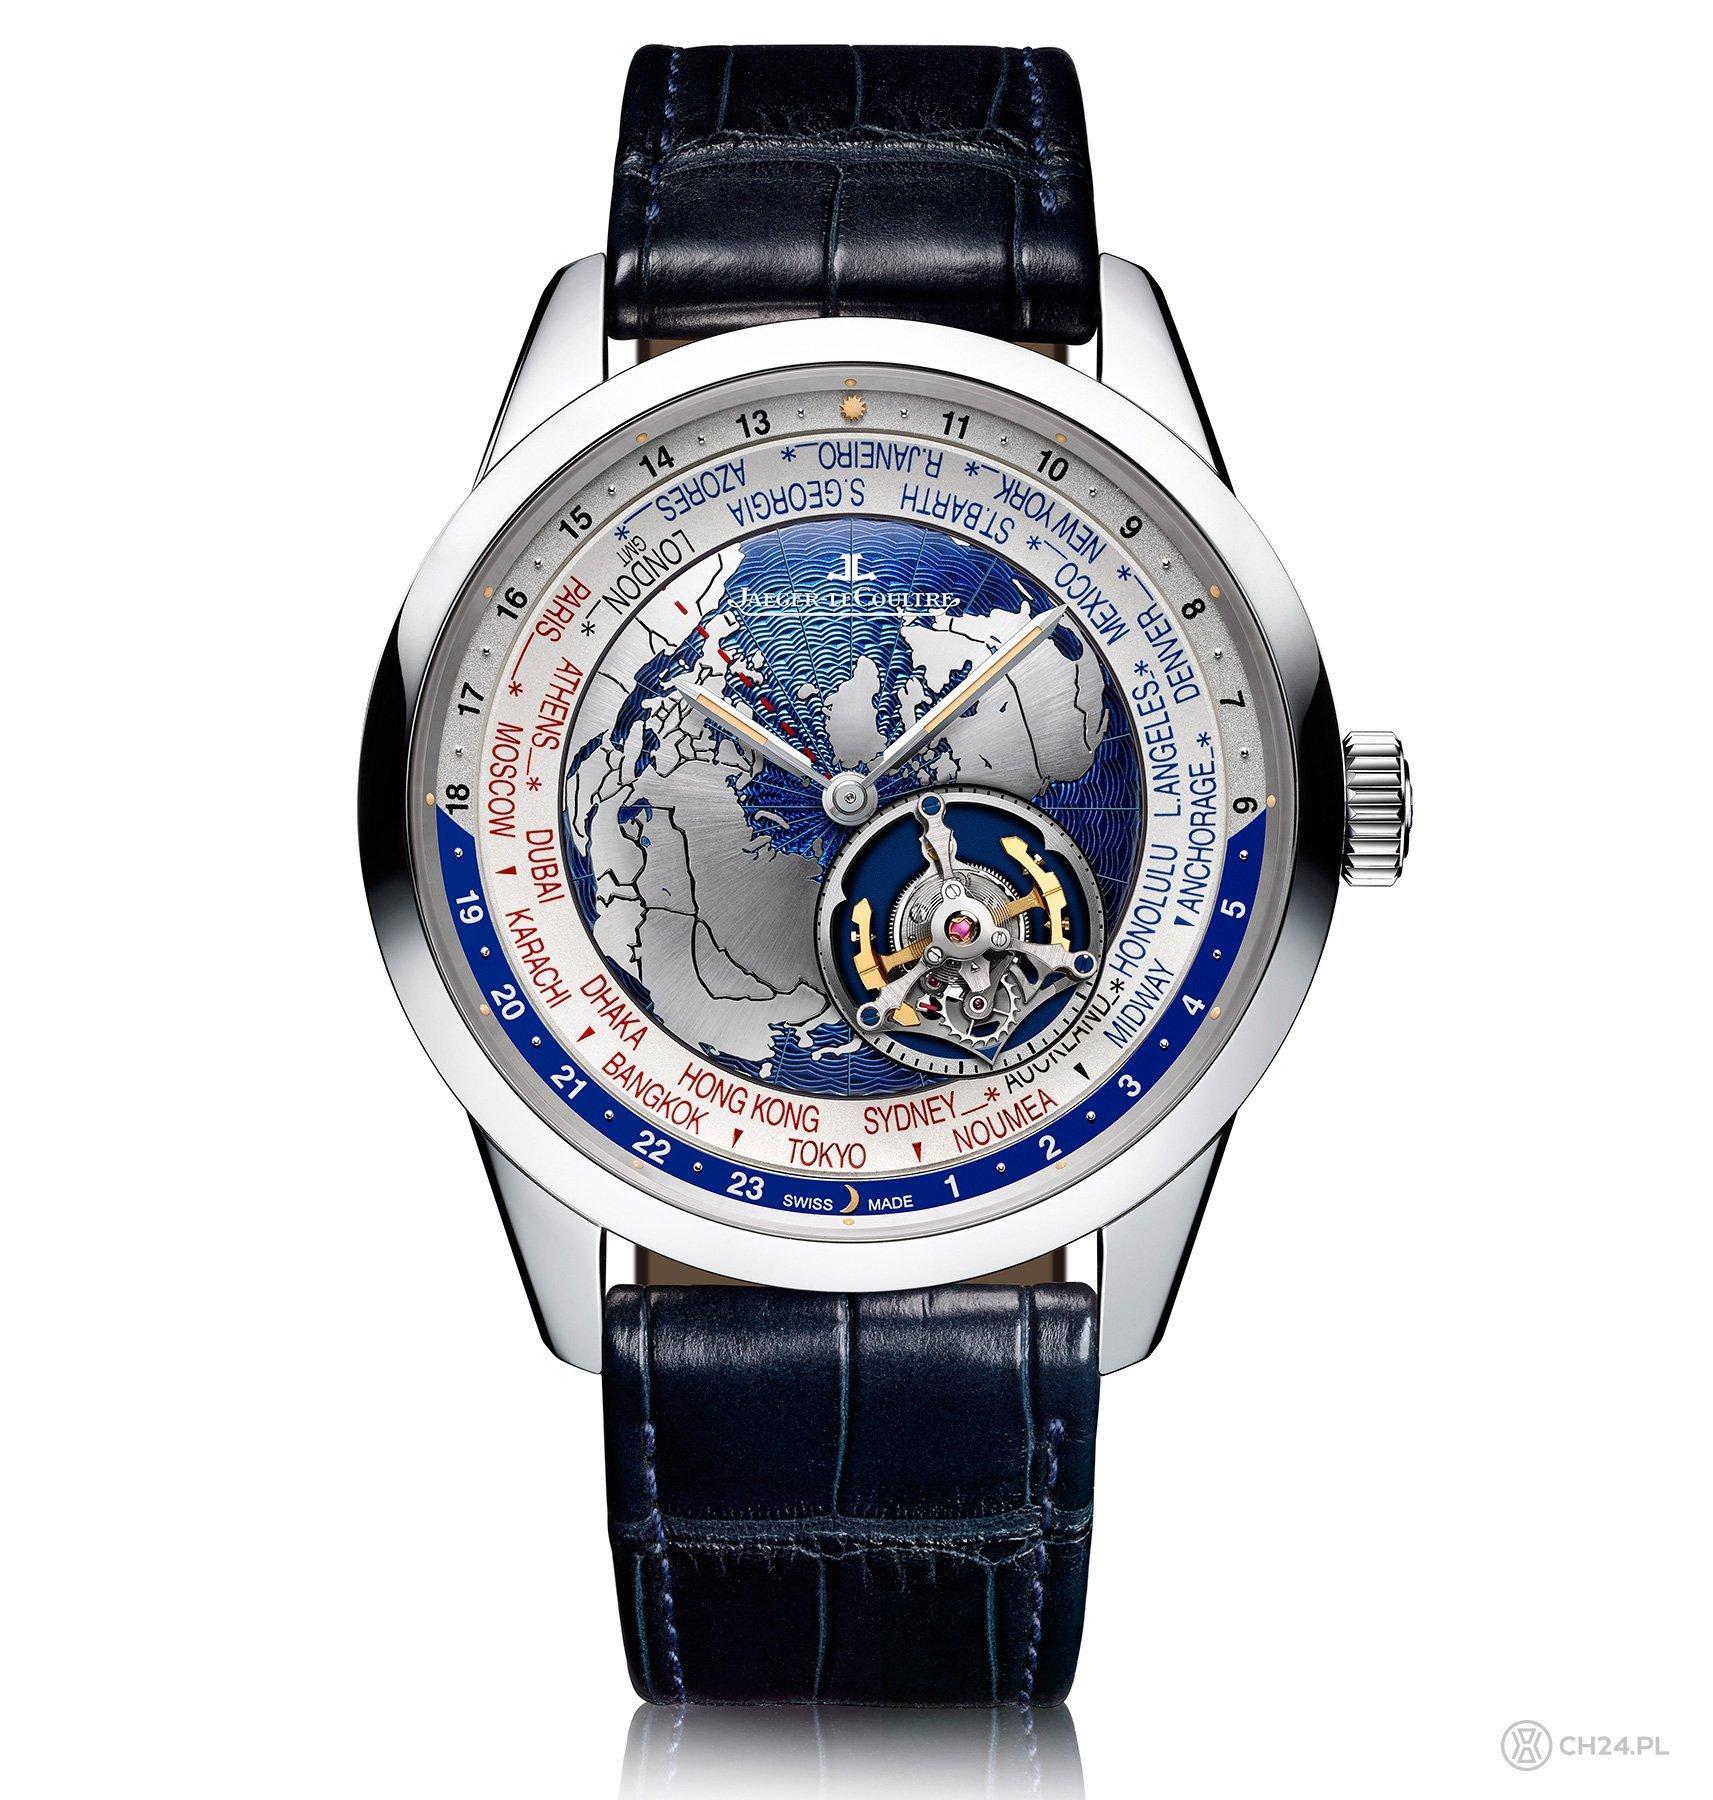 Часы Chanel J12 SWISSCHRONORU